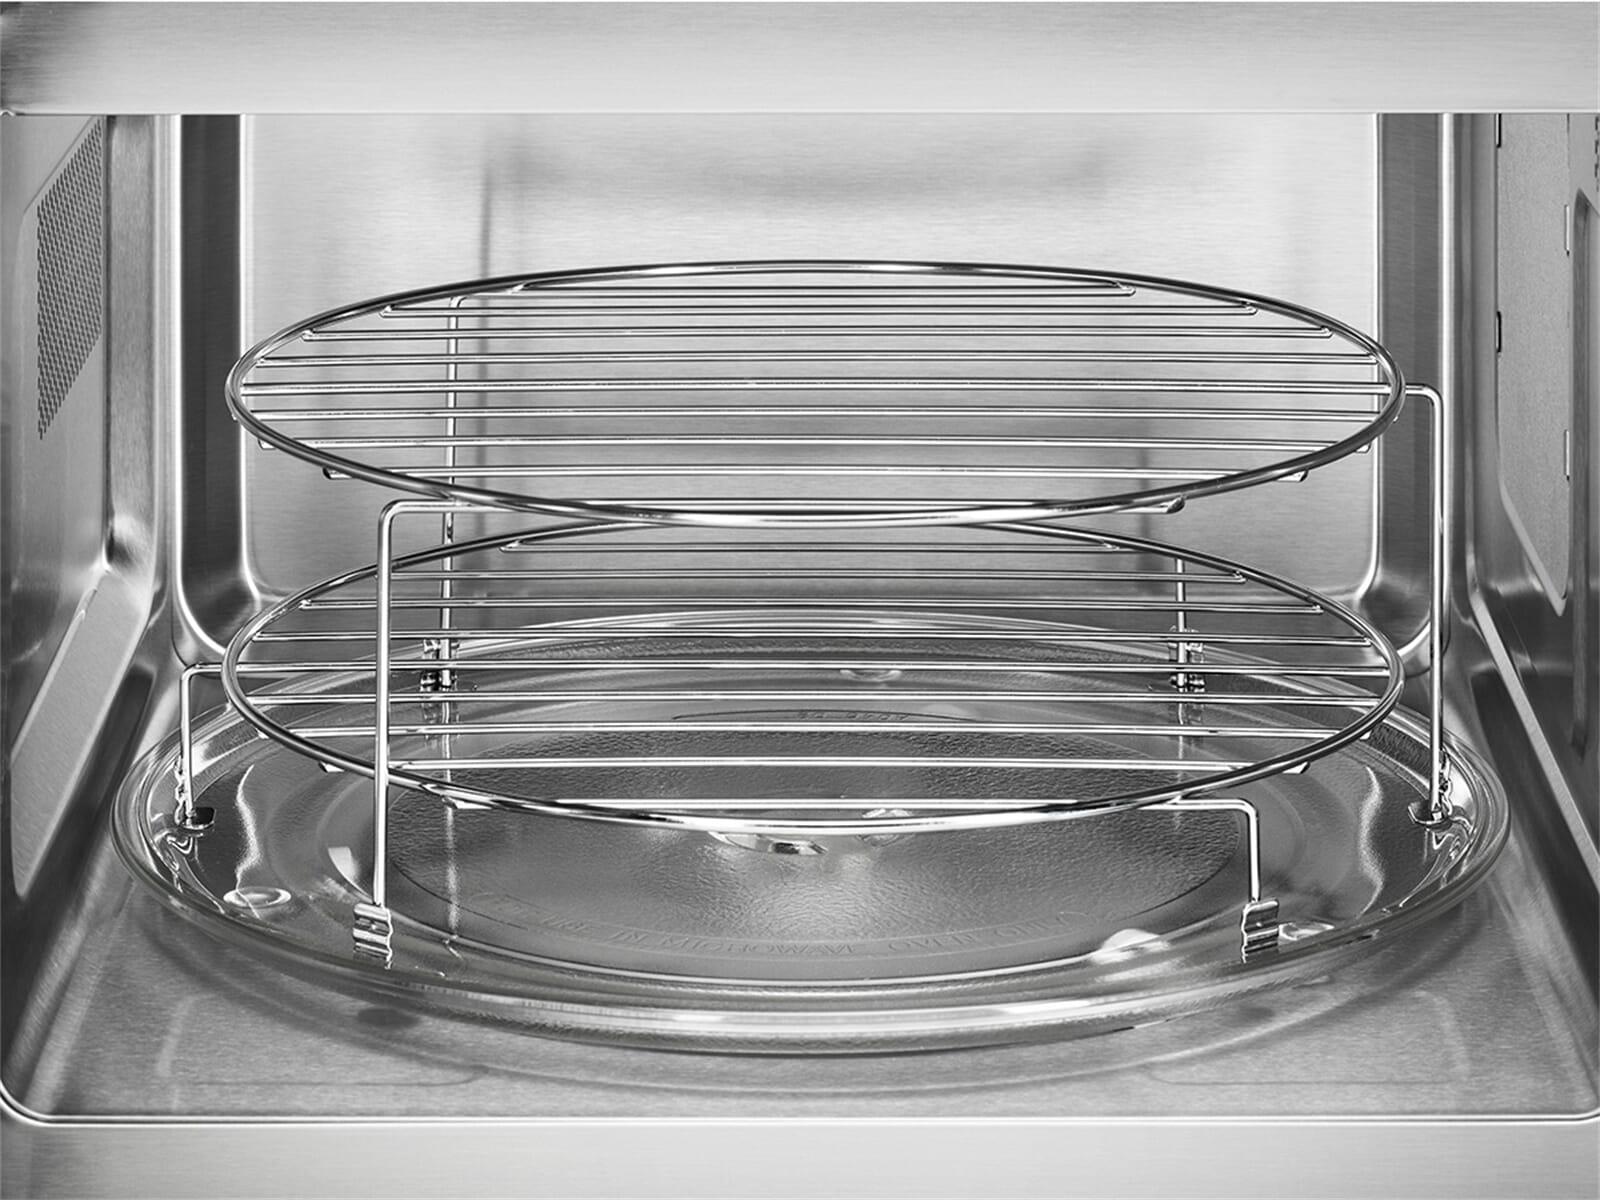 aeg mbb1756d m einbau mikrowelle edelstahl. Black Bedroom Furniture Sets. Home Design Ideas